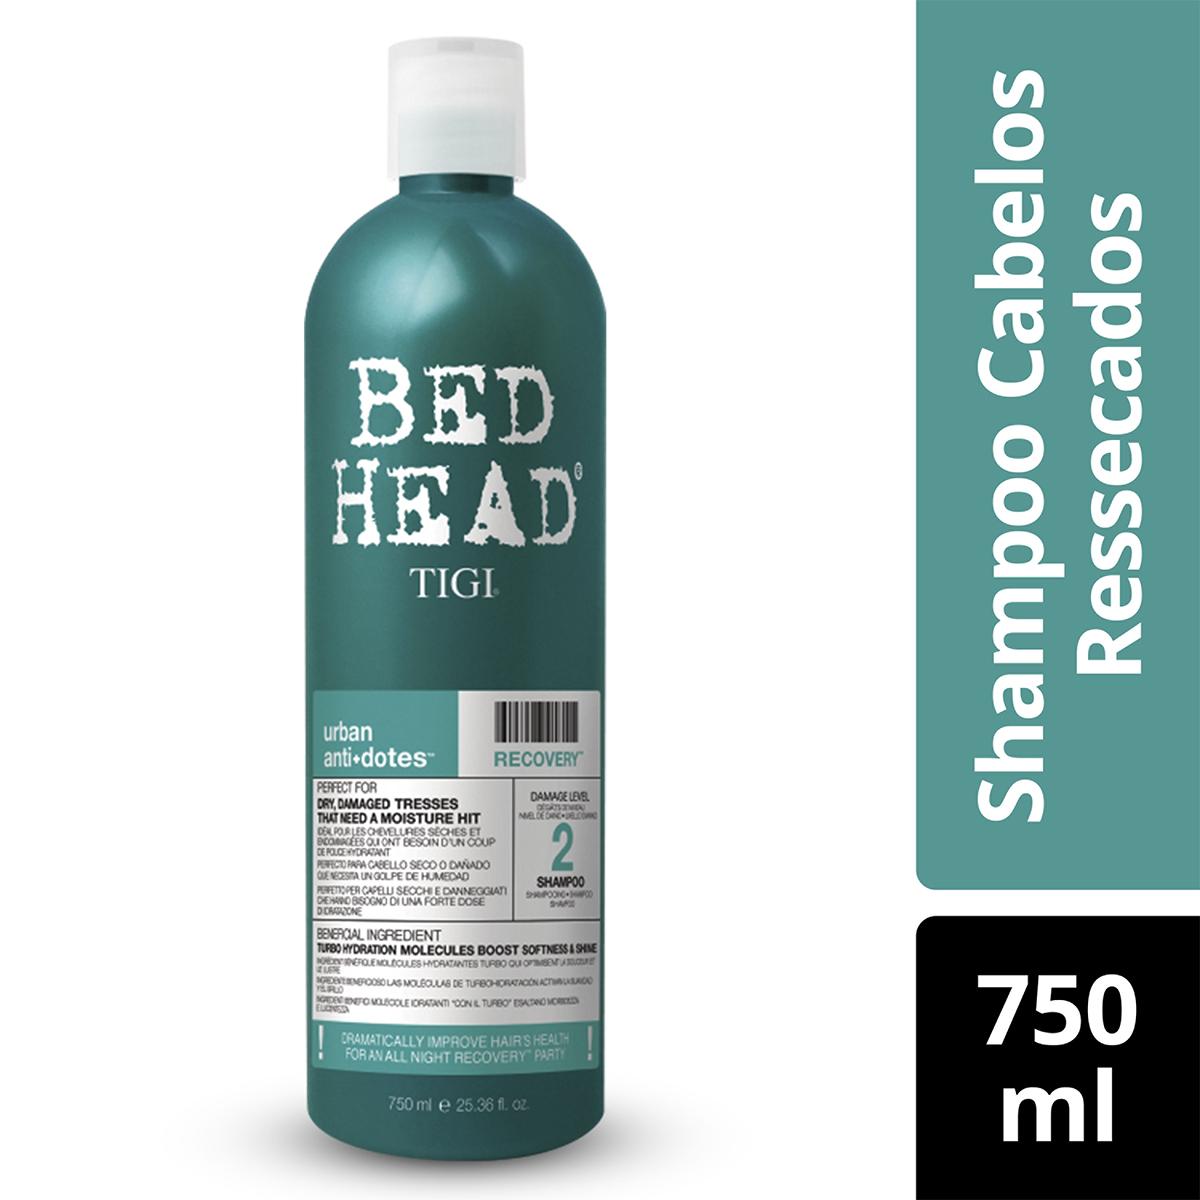 Shampoo Bed Head Recovery Cabelos Ressecados 750ml 750ml